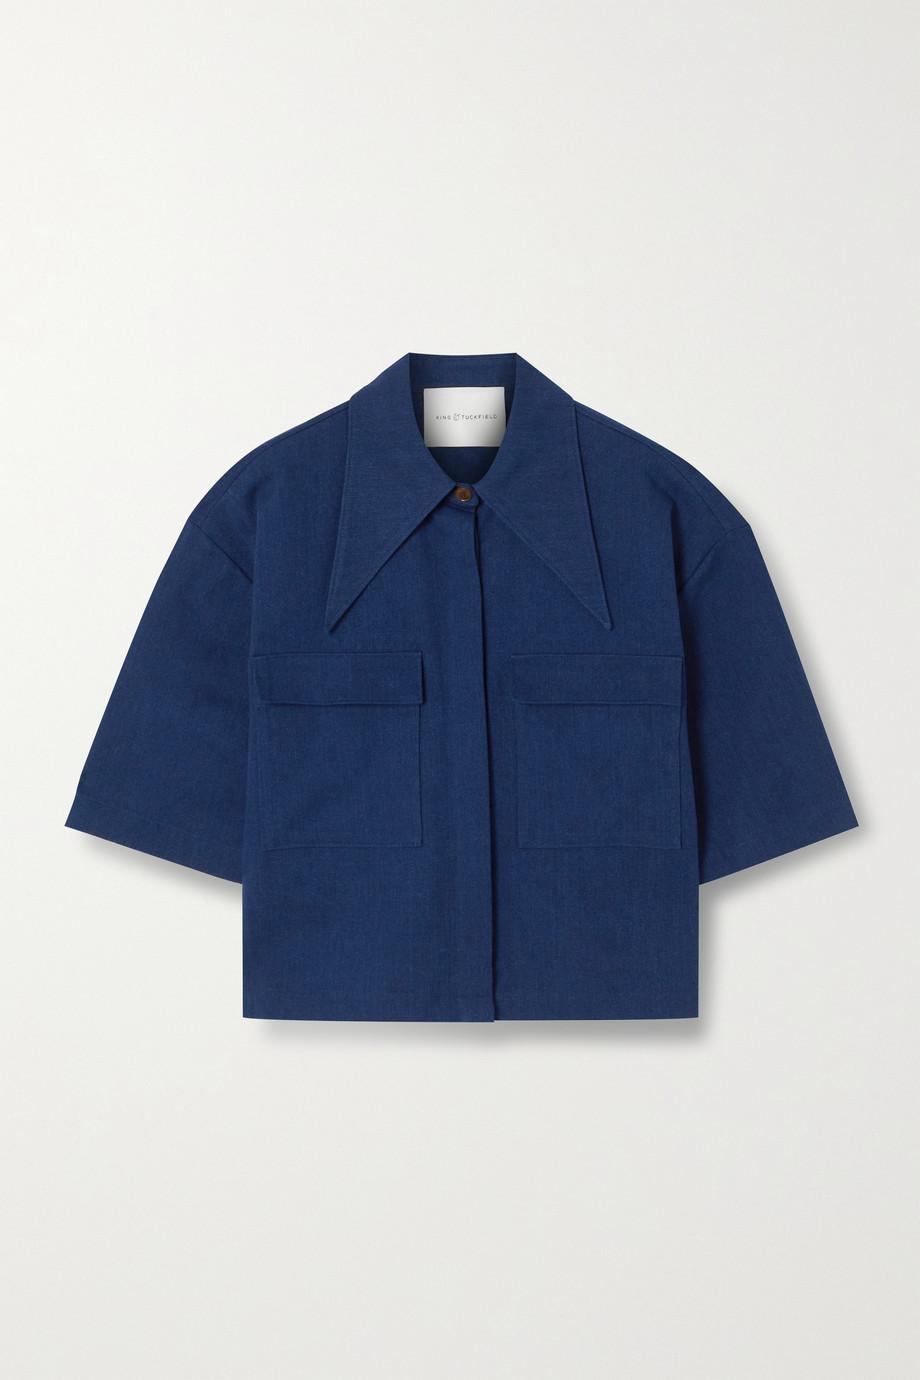 King & Tuckfield Denim shirt